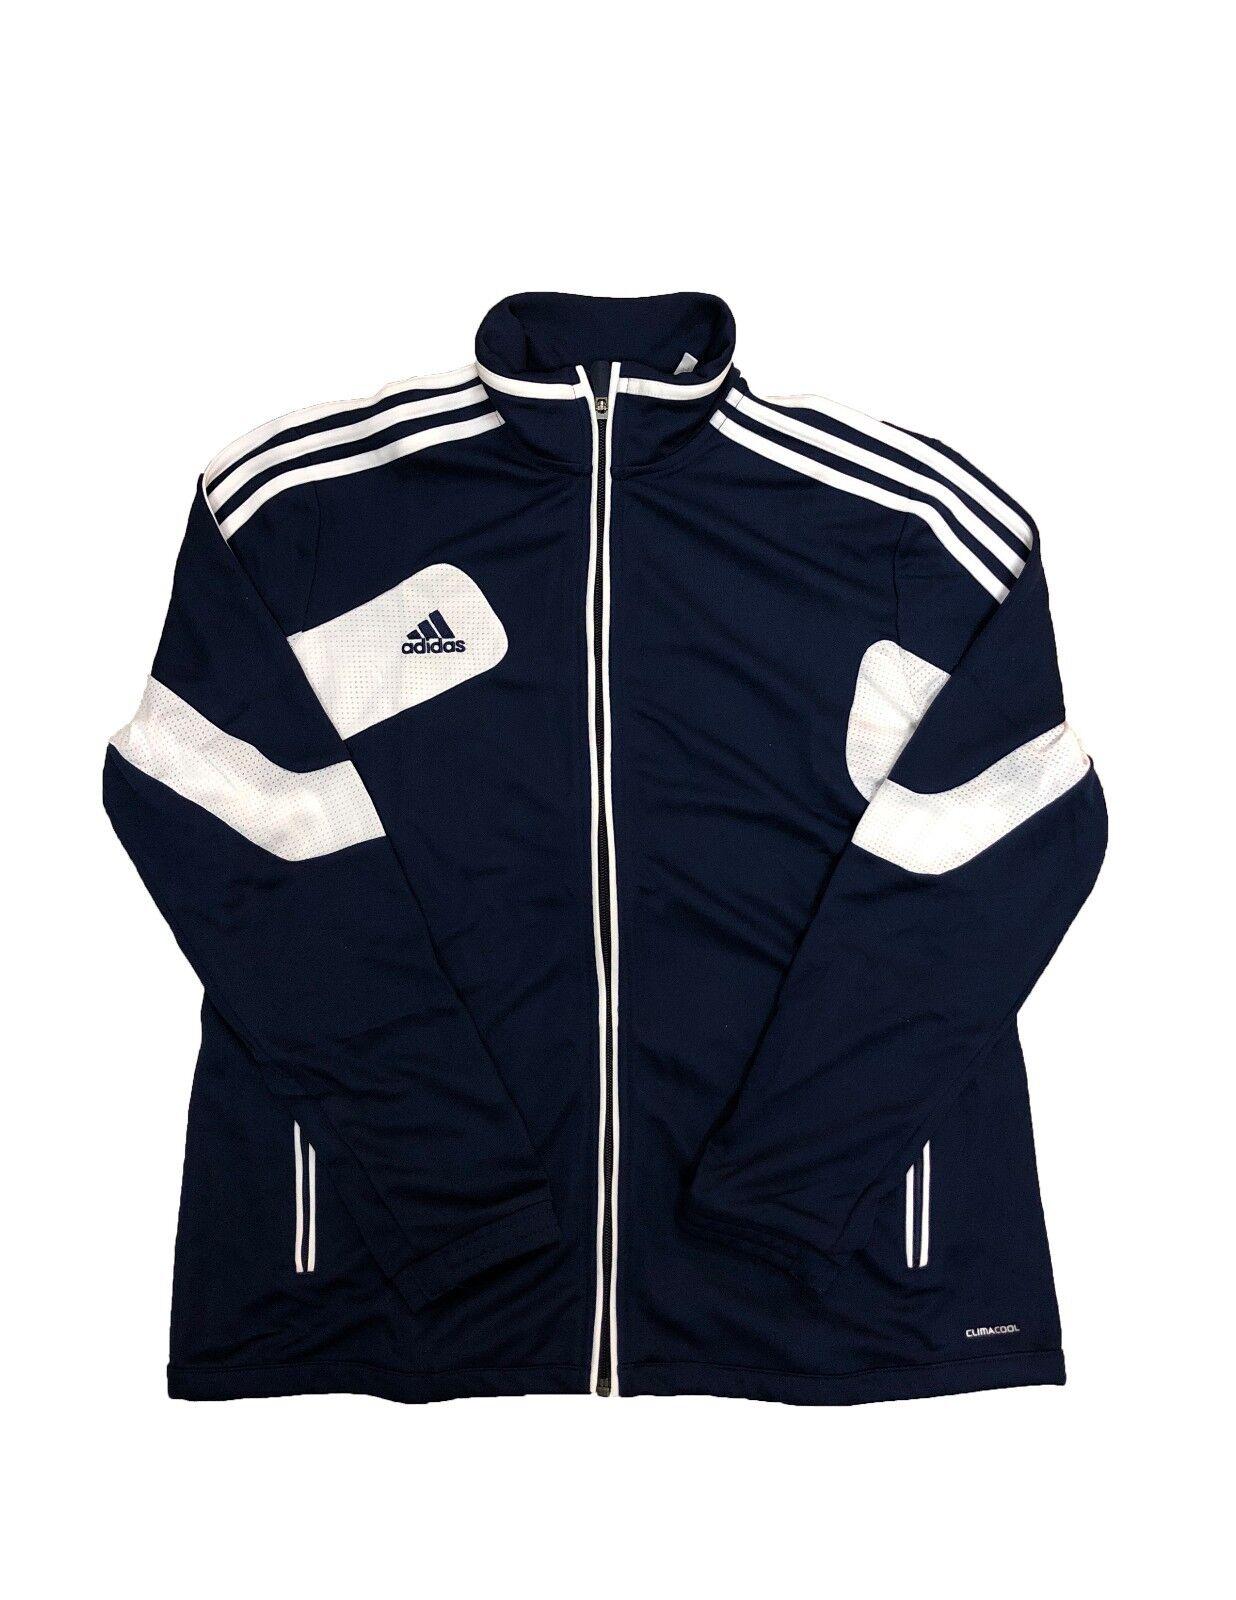 adidas Condivo 12 Training Jacket Navy Blue Soccer Womens XL